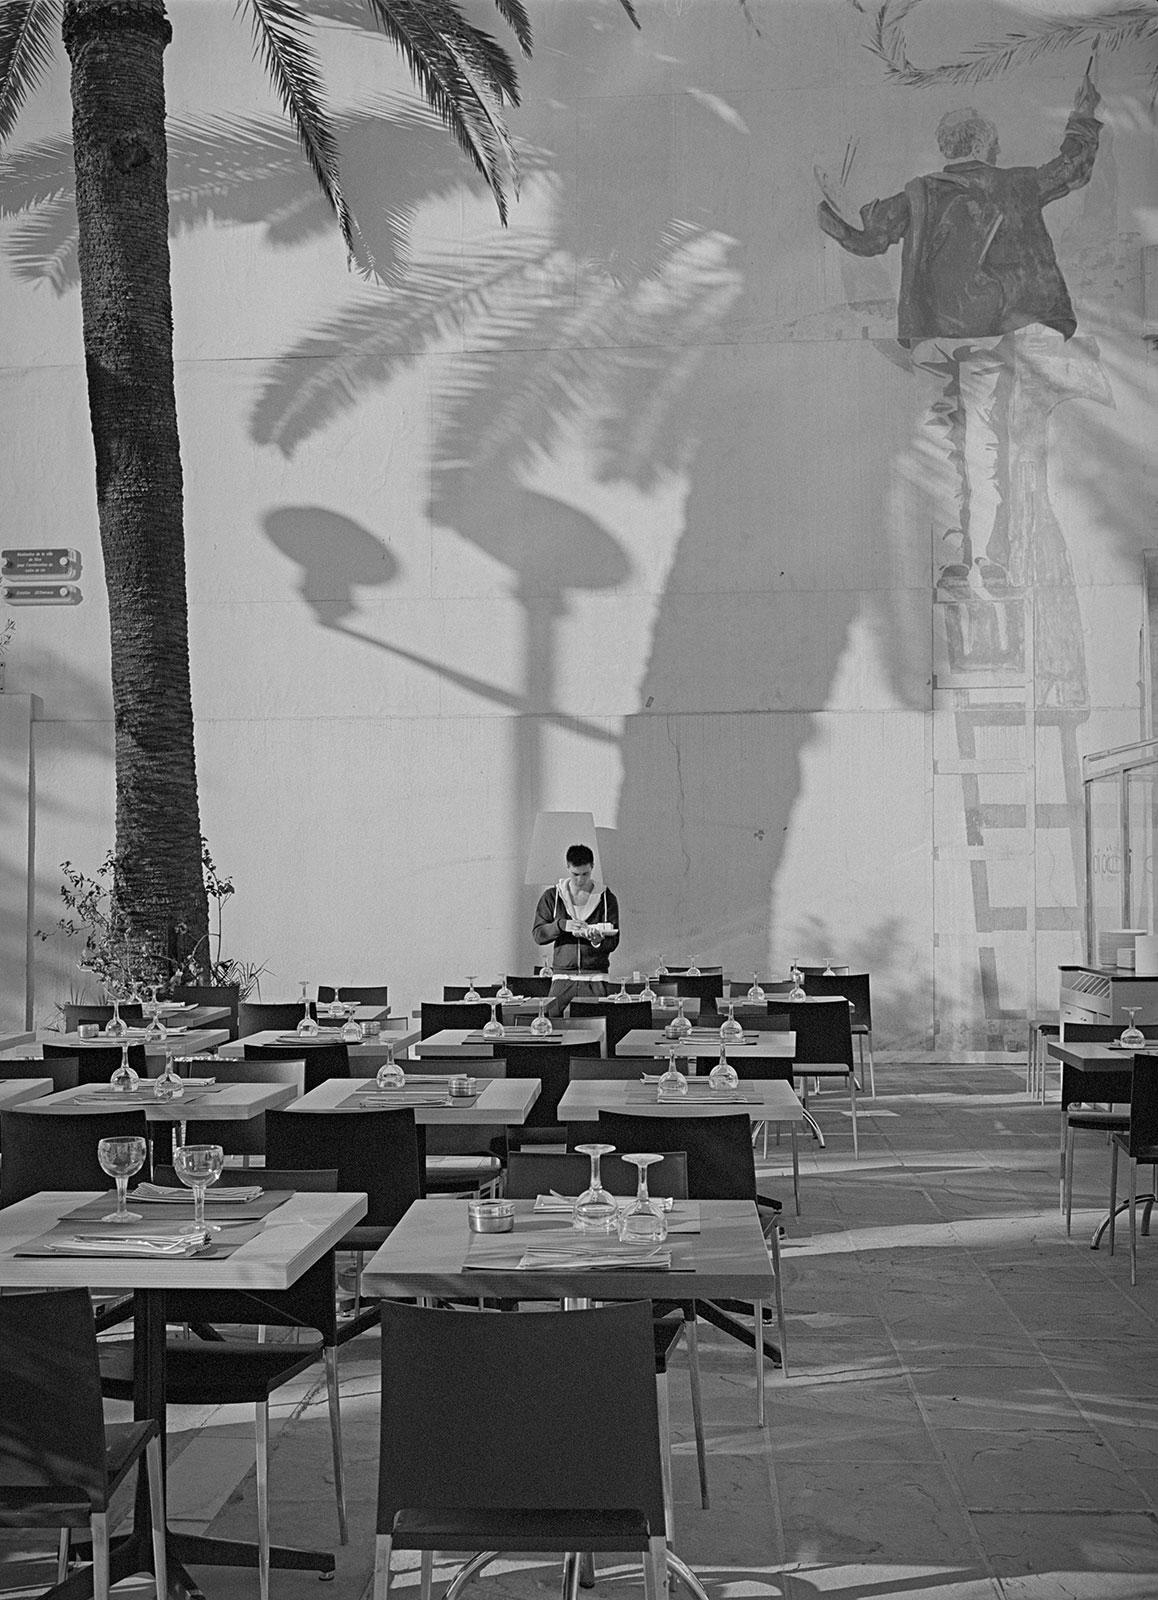 Swinging palm trees